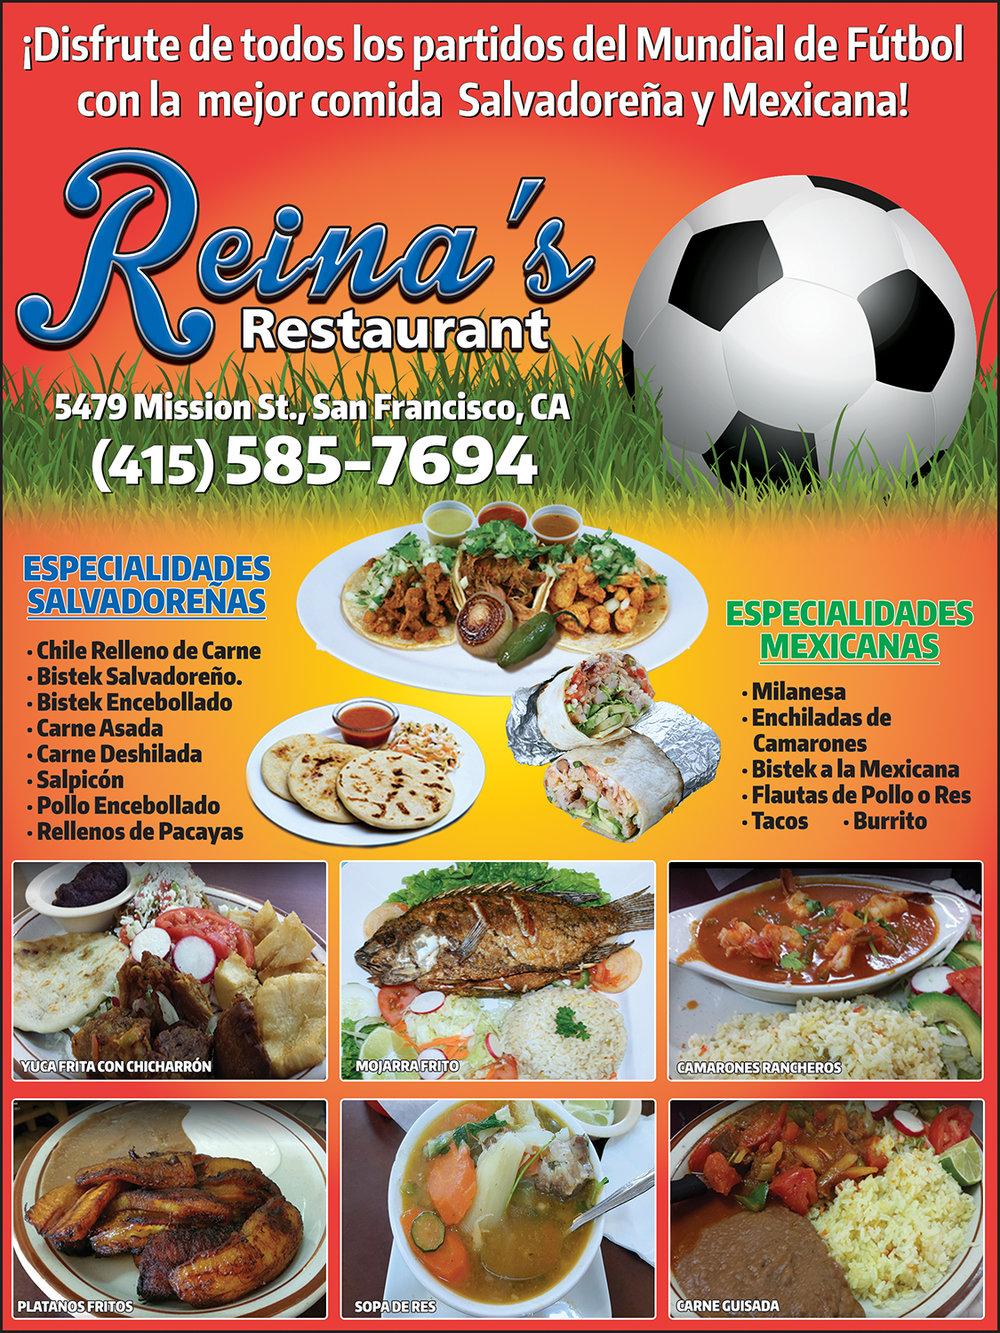 Reinas Restaurant 1 pAG GLOSSY - JUNIO 2018 copy.jpg